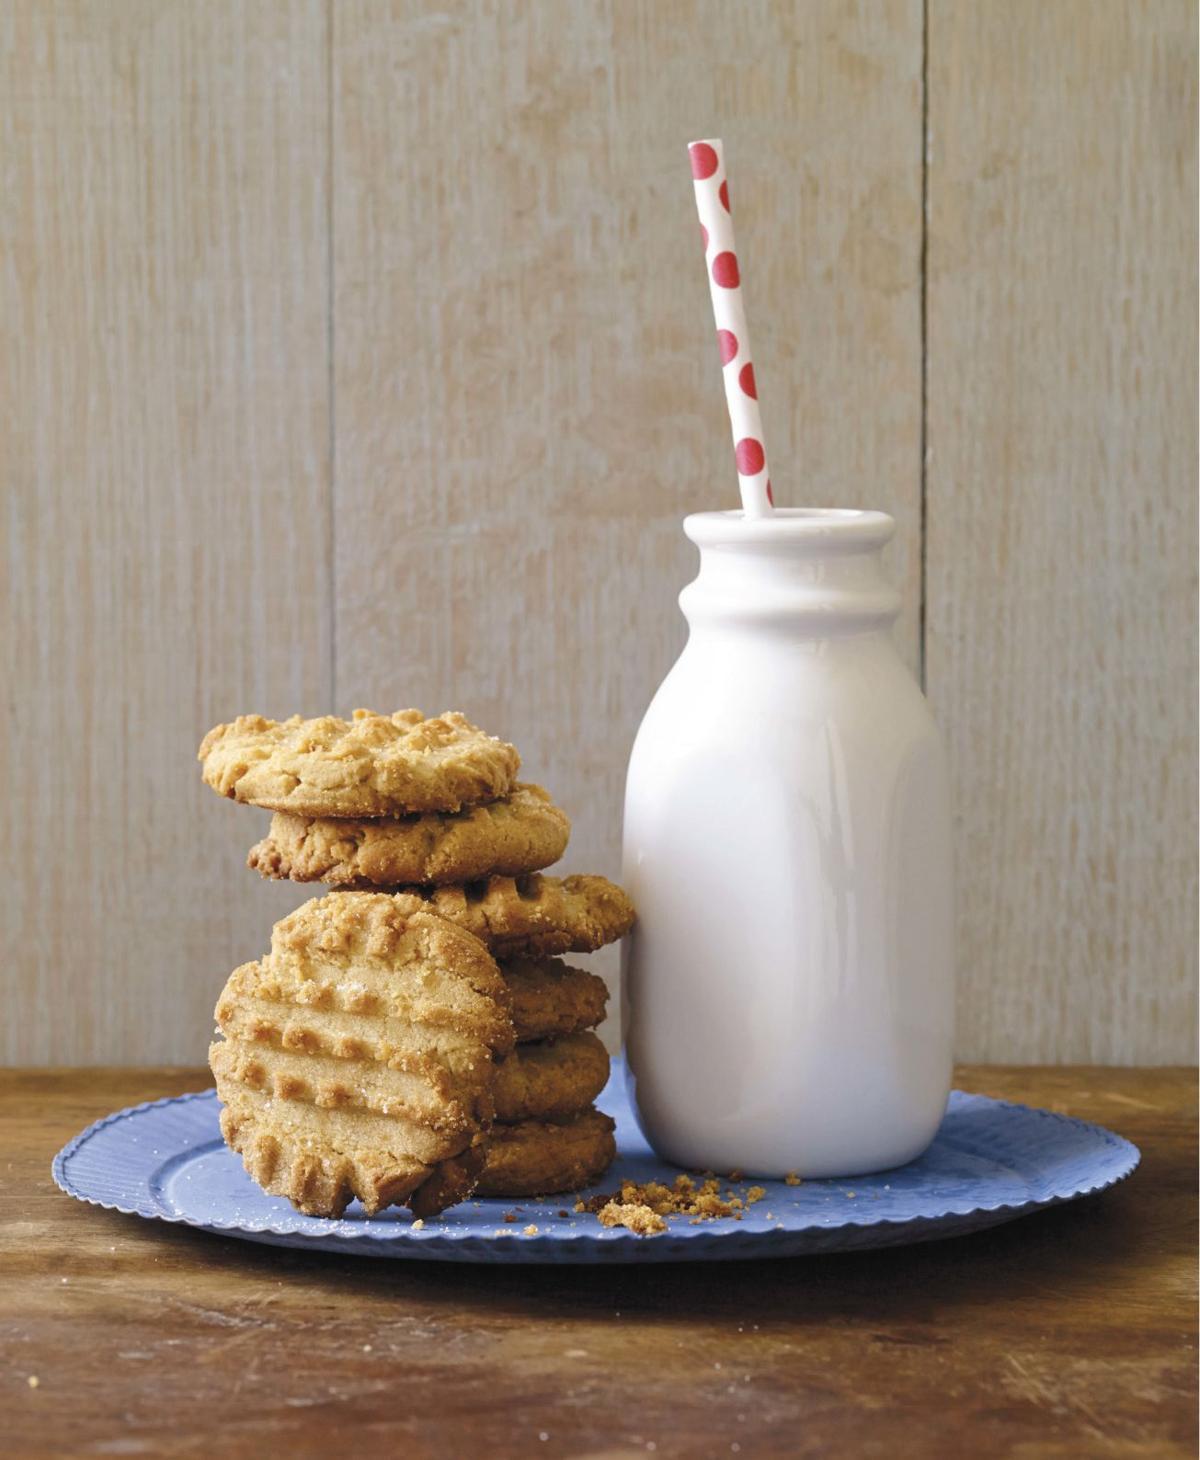 School_Lunch_Peanut_Butter_Cookies